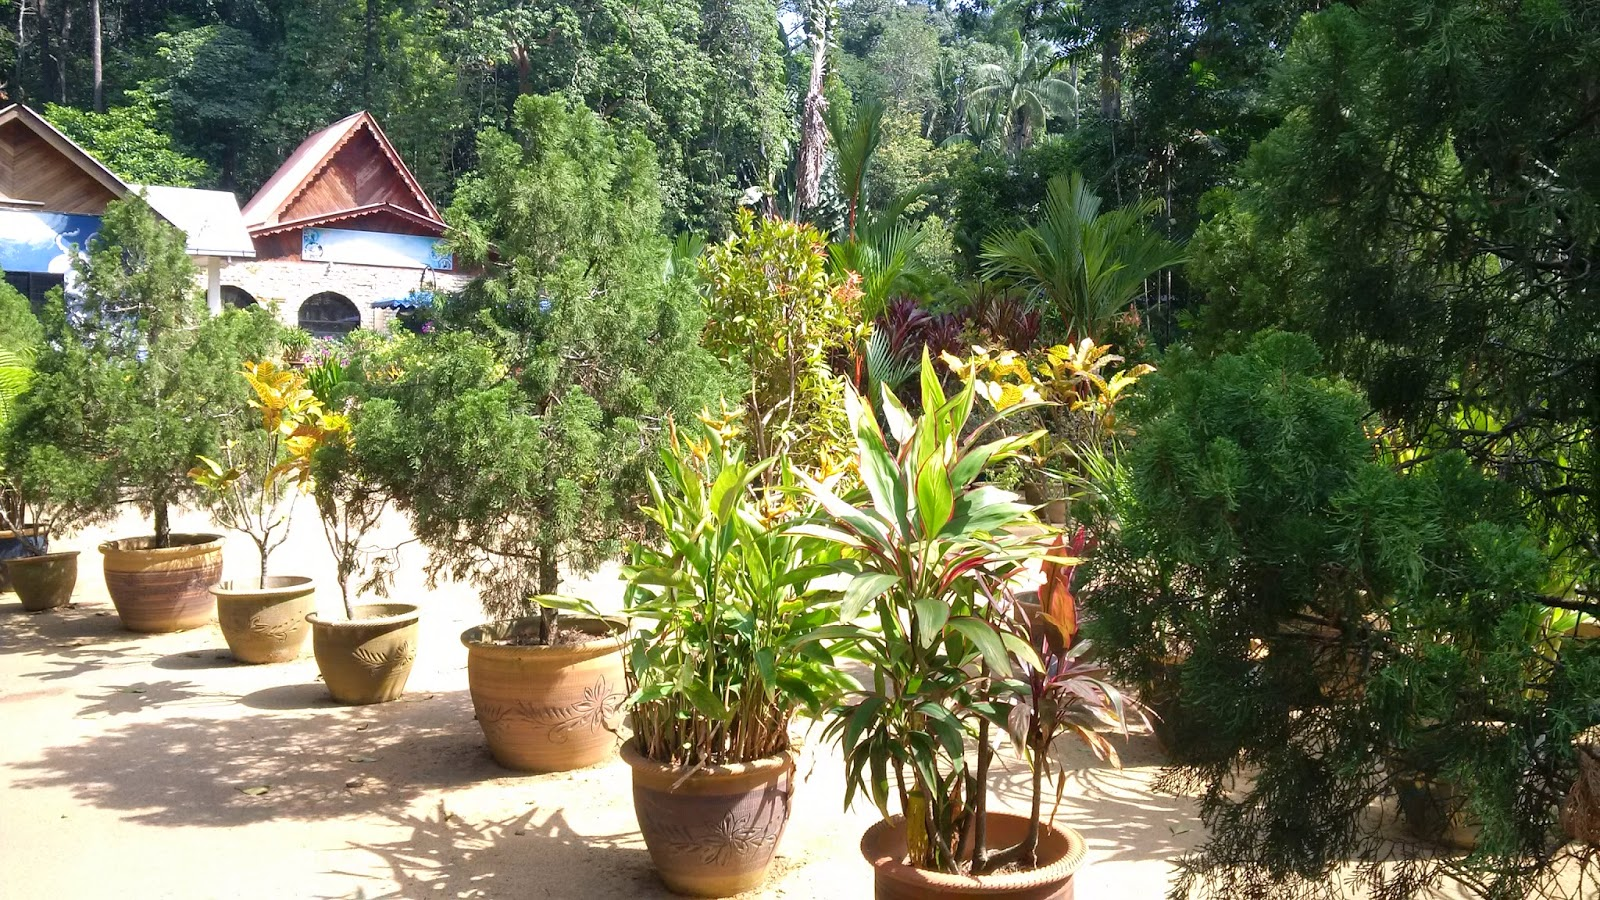 taman botanikal melaka, spieces fauna and floral, tourism, travel, orchids garden, bamboo garden, heliconia, herbal, taro, yam